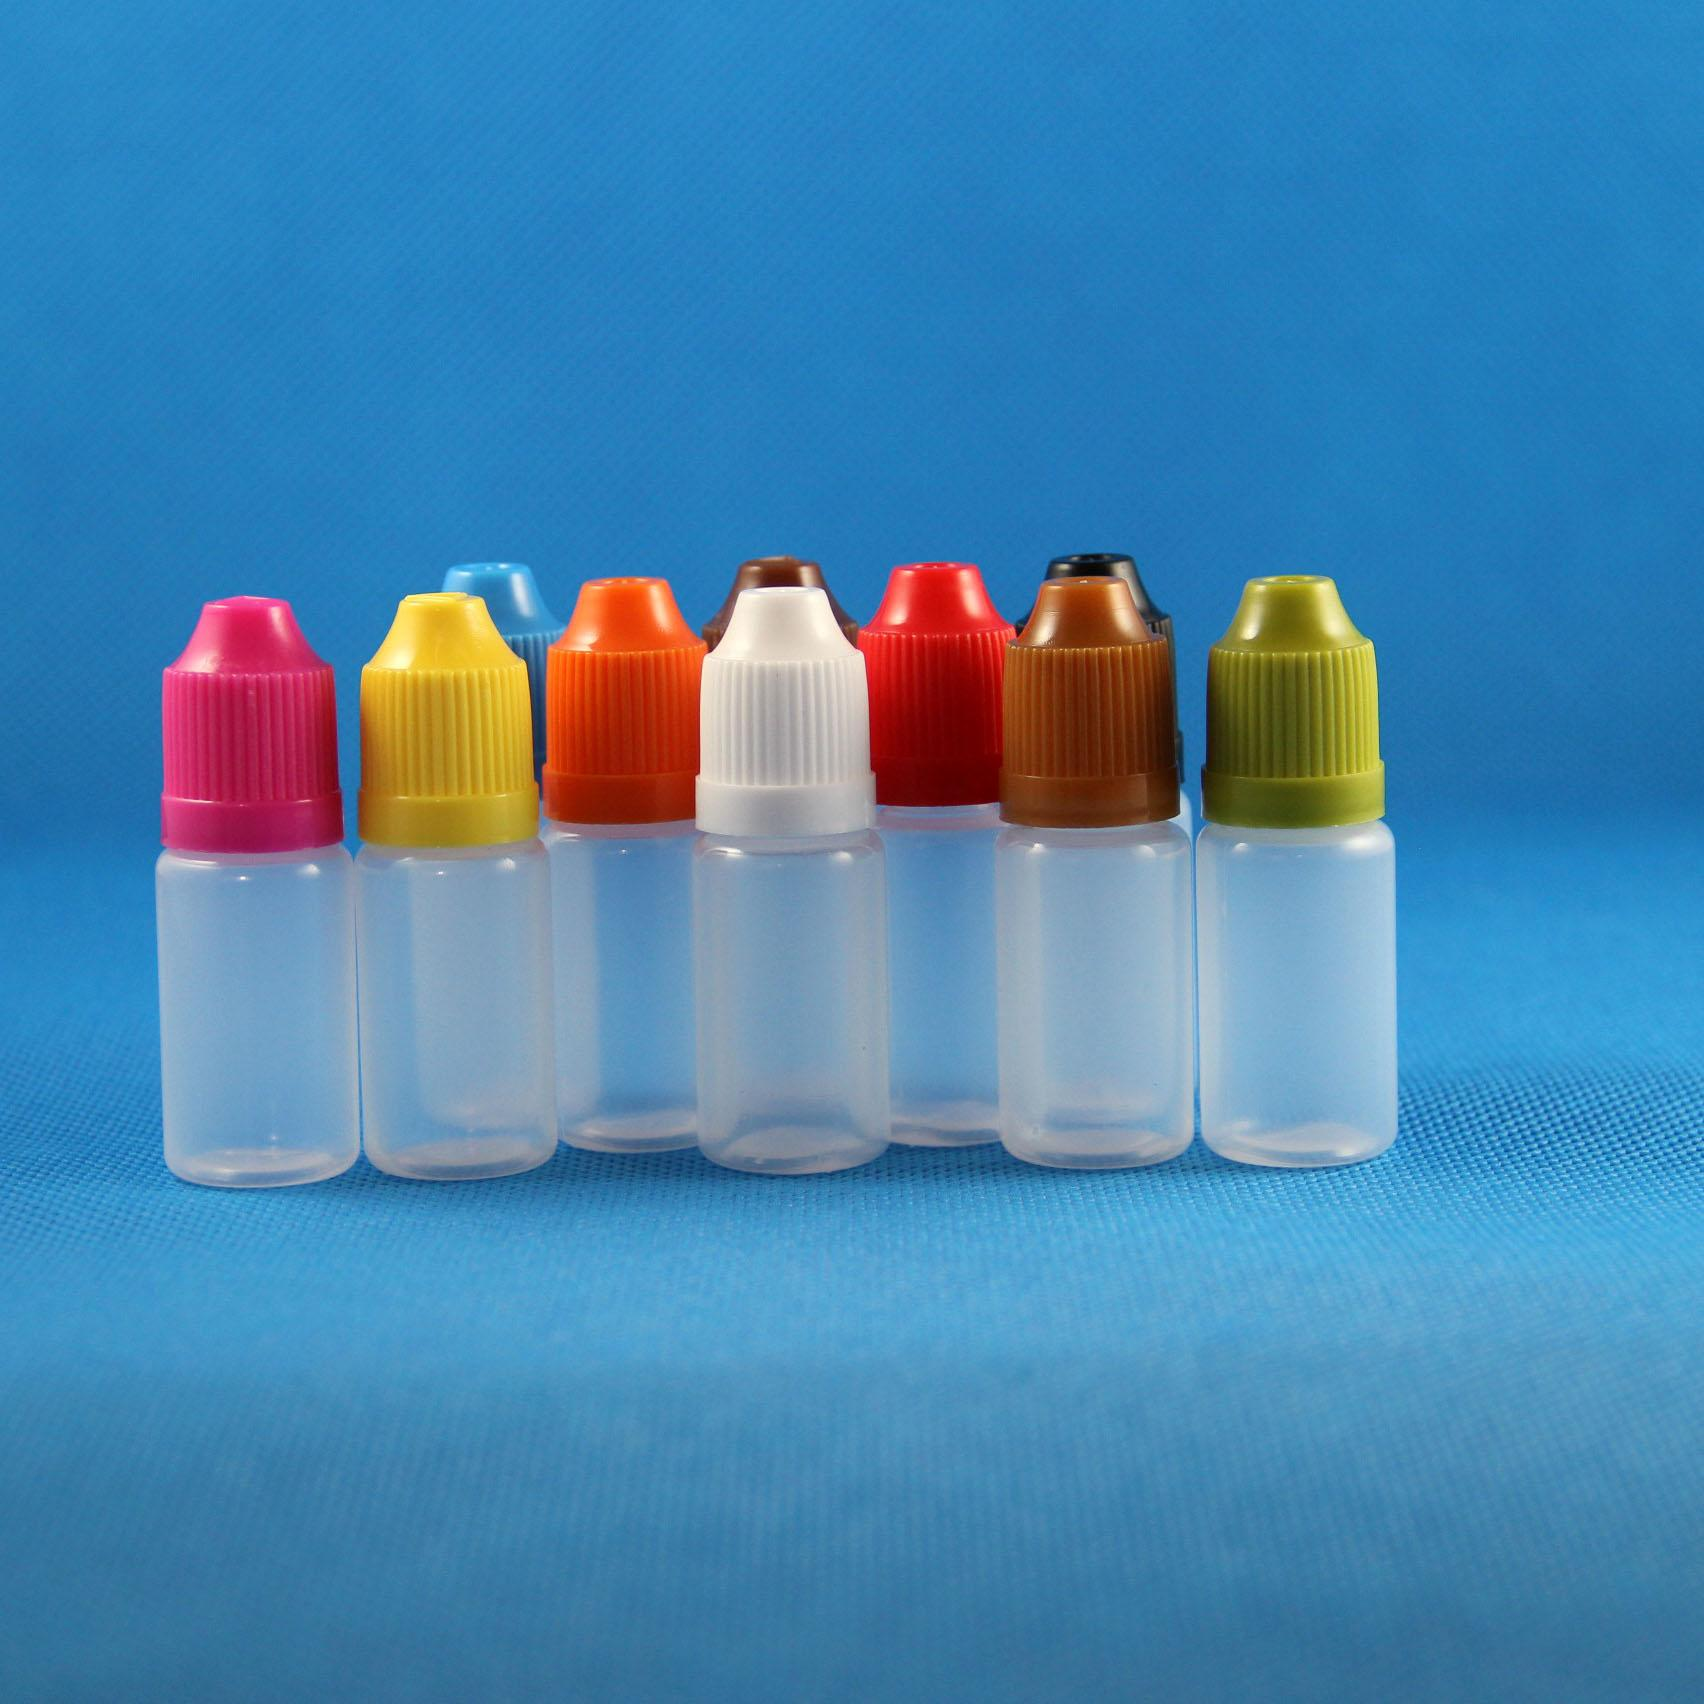 100 Sets 8 ml (1/4 oz) Plastic DROPPER Flessen Kindveilige Caps Tips PE LDPE E VAPOR CIG LIQUE 8 ML